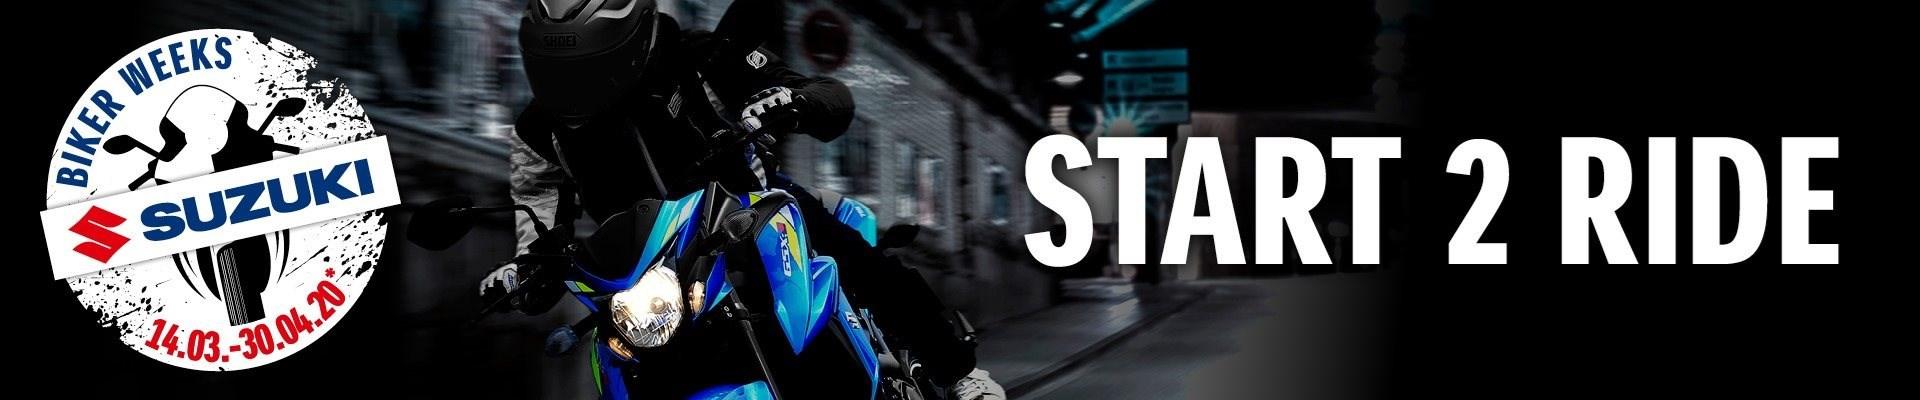 Motorrad Termin Biker's Day 2020